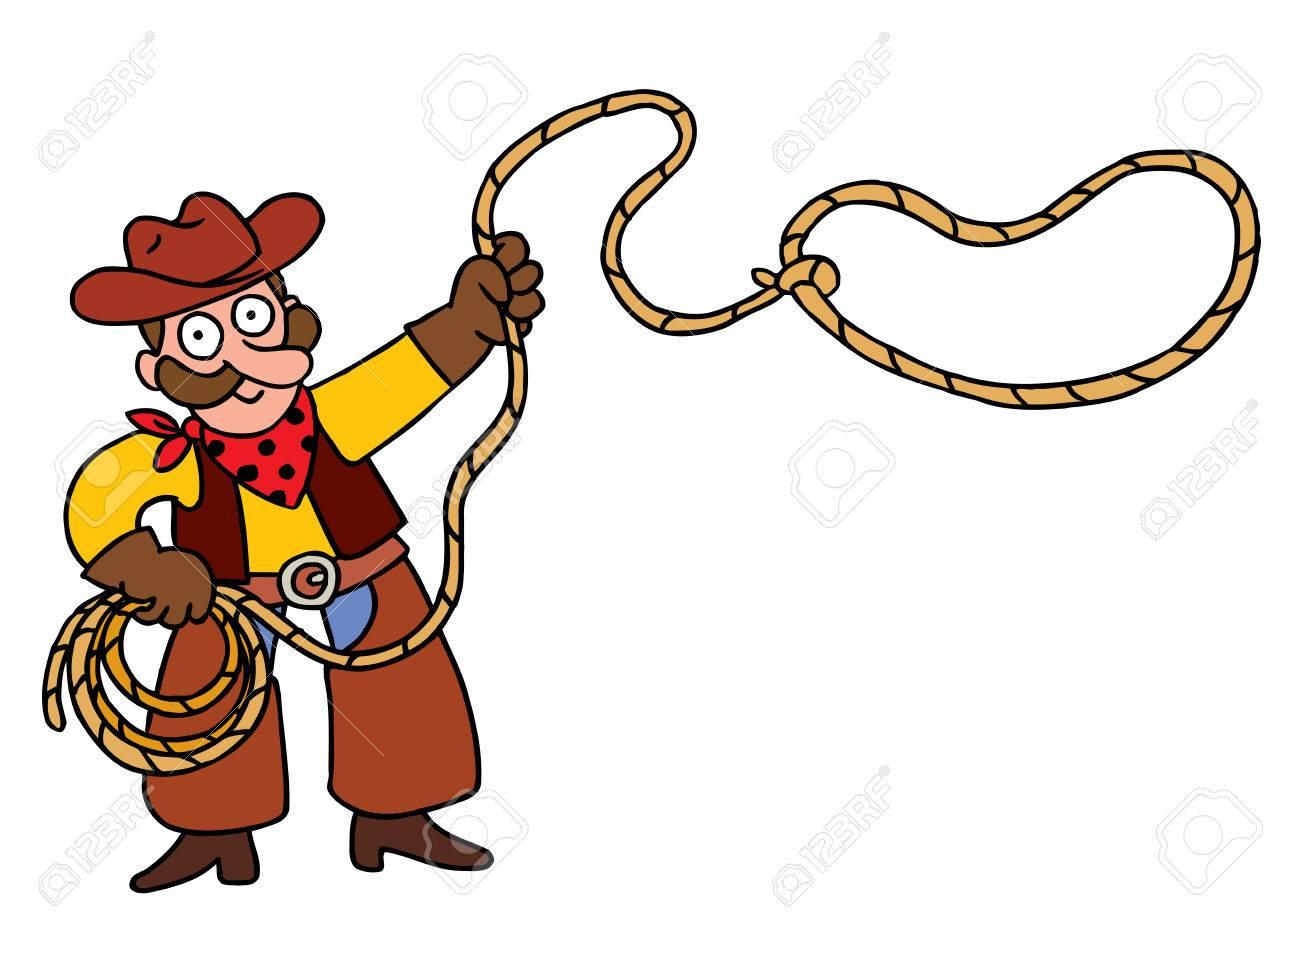 cowboy with lasso.